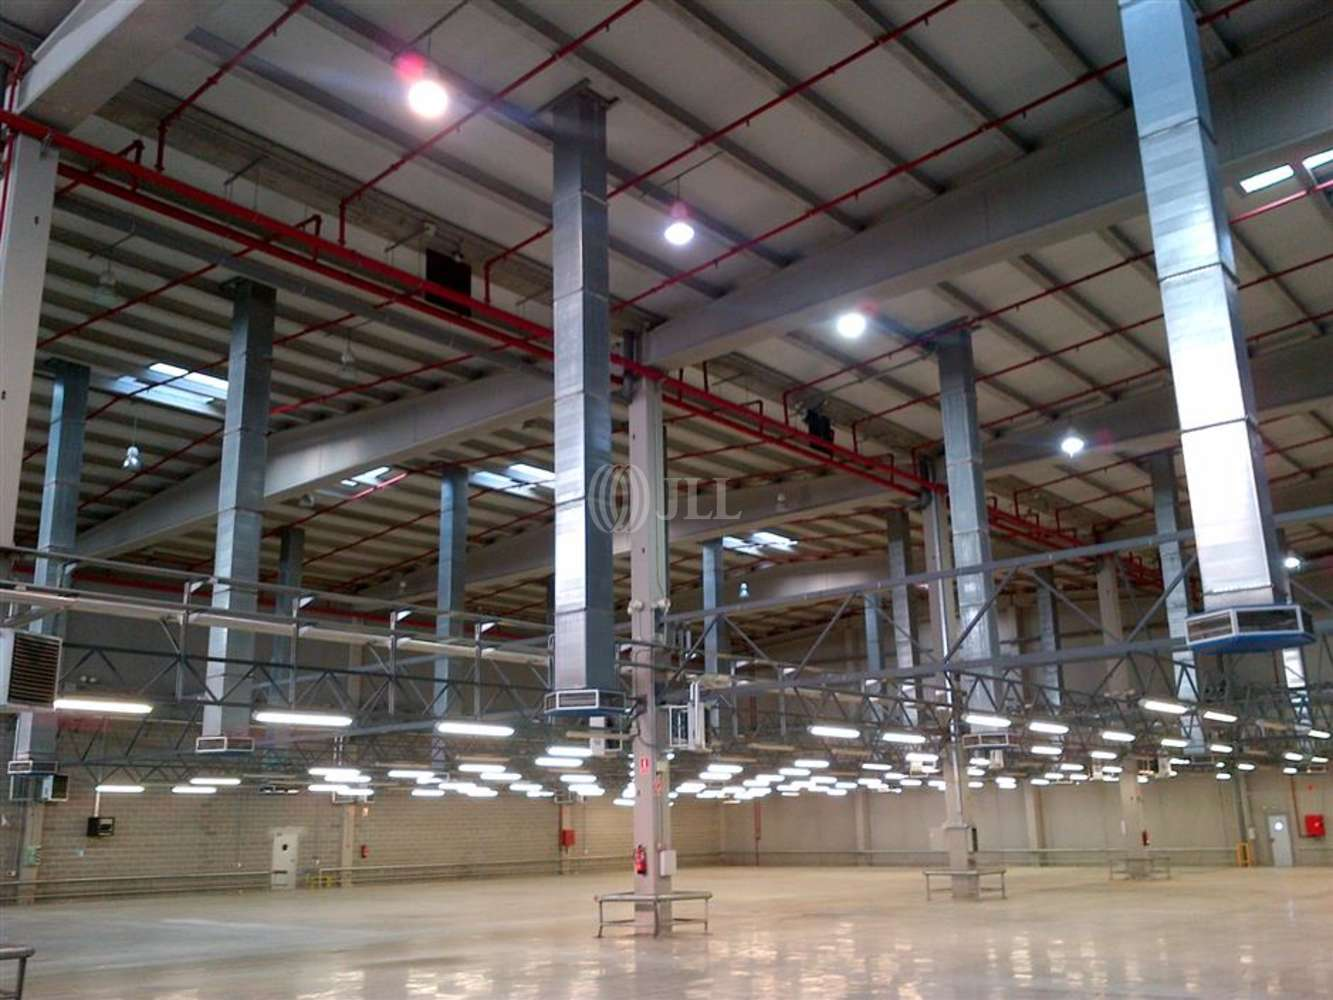 Naves industriales y logísticas Barcelona, 08040 - Nave Logistica - B0059 - PI PARC LOGISTIC ZONA FRANCA